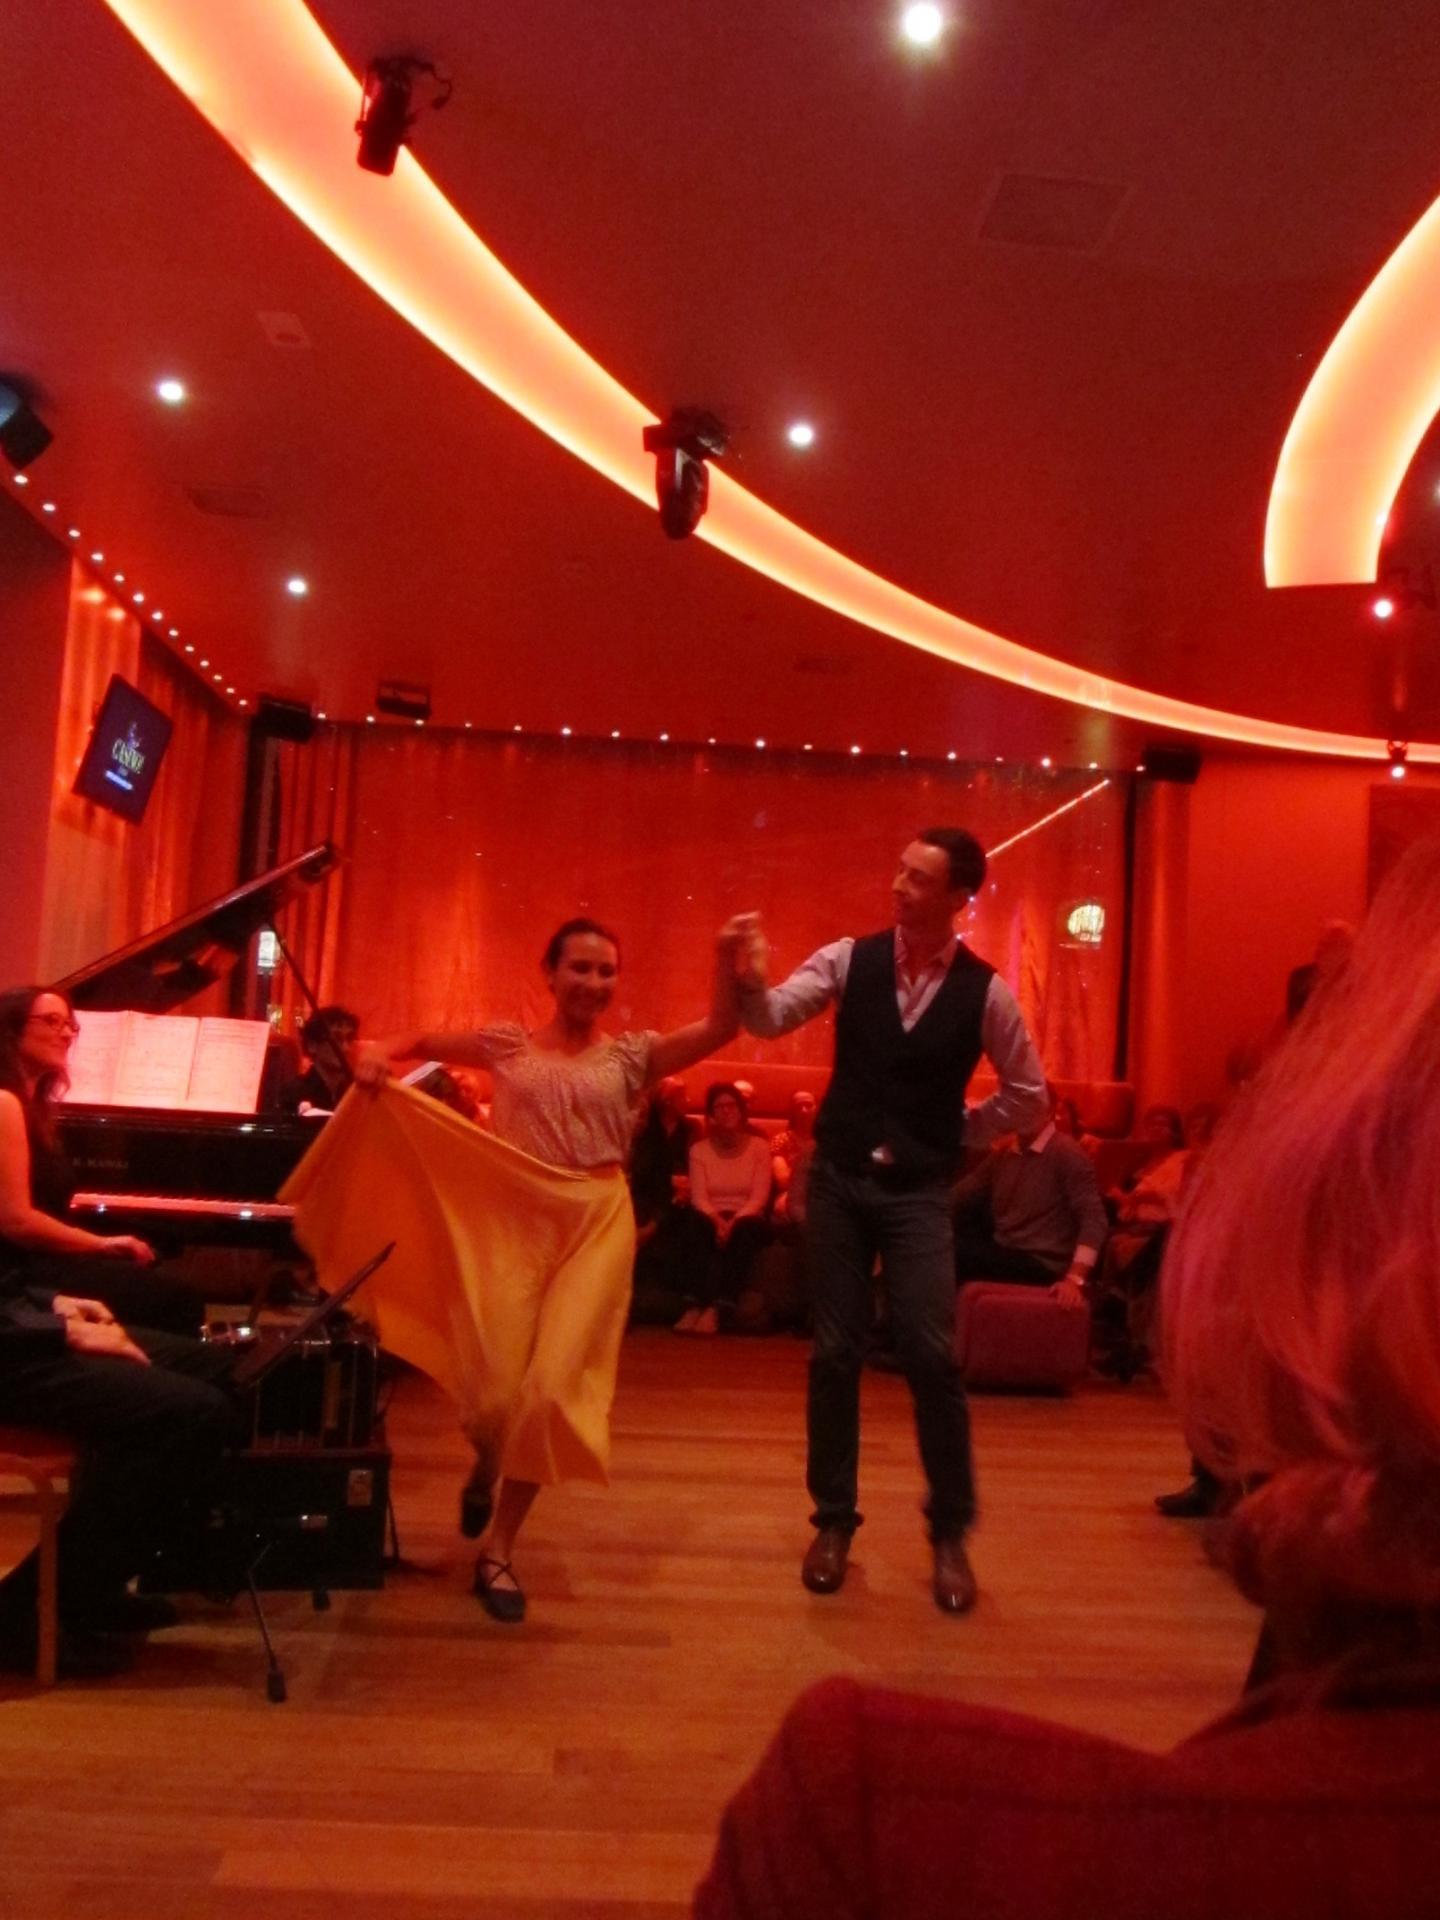 Ticiana Brandan (danseuse), Johannes Quintens (danseur)